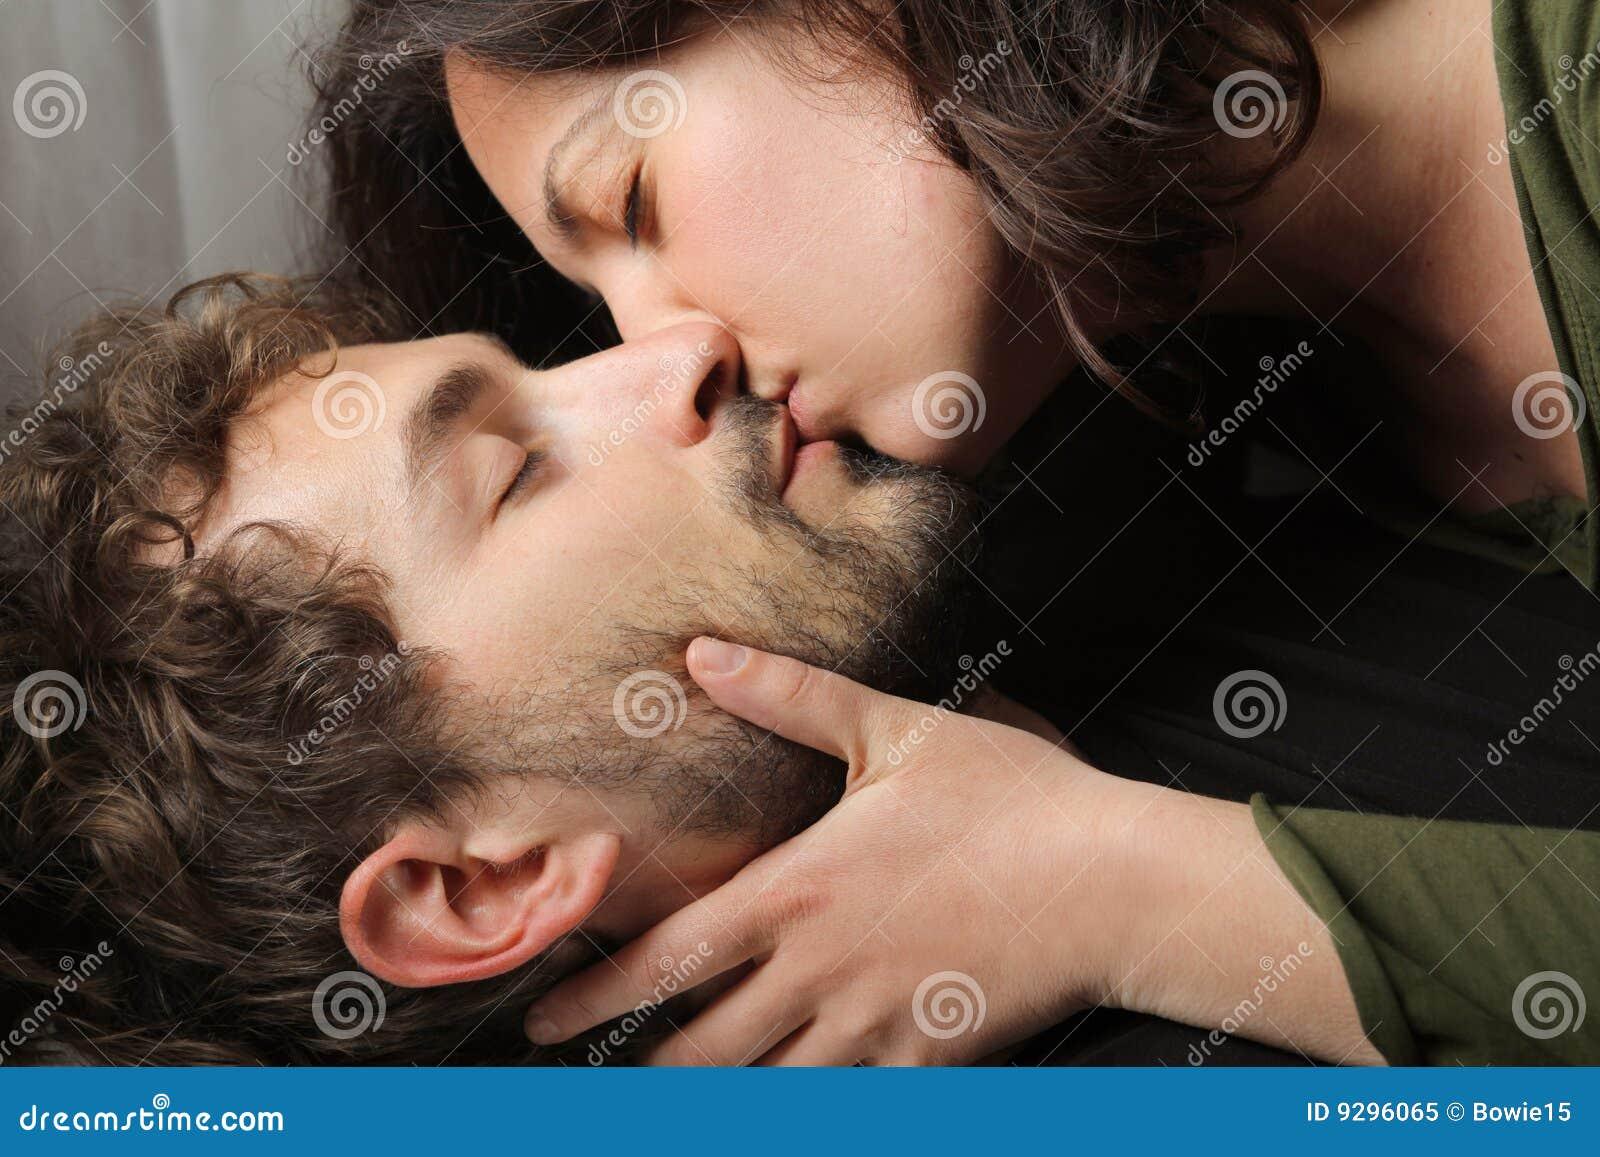 Kiss Royalty Free Stock Photo - Image: 9296065